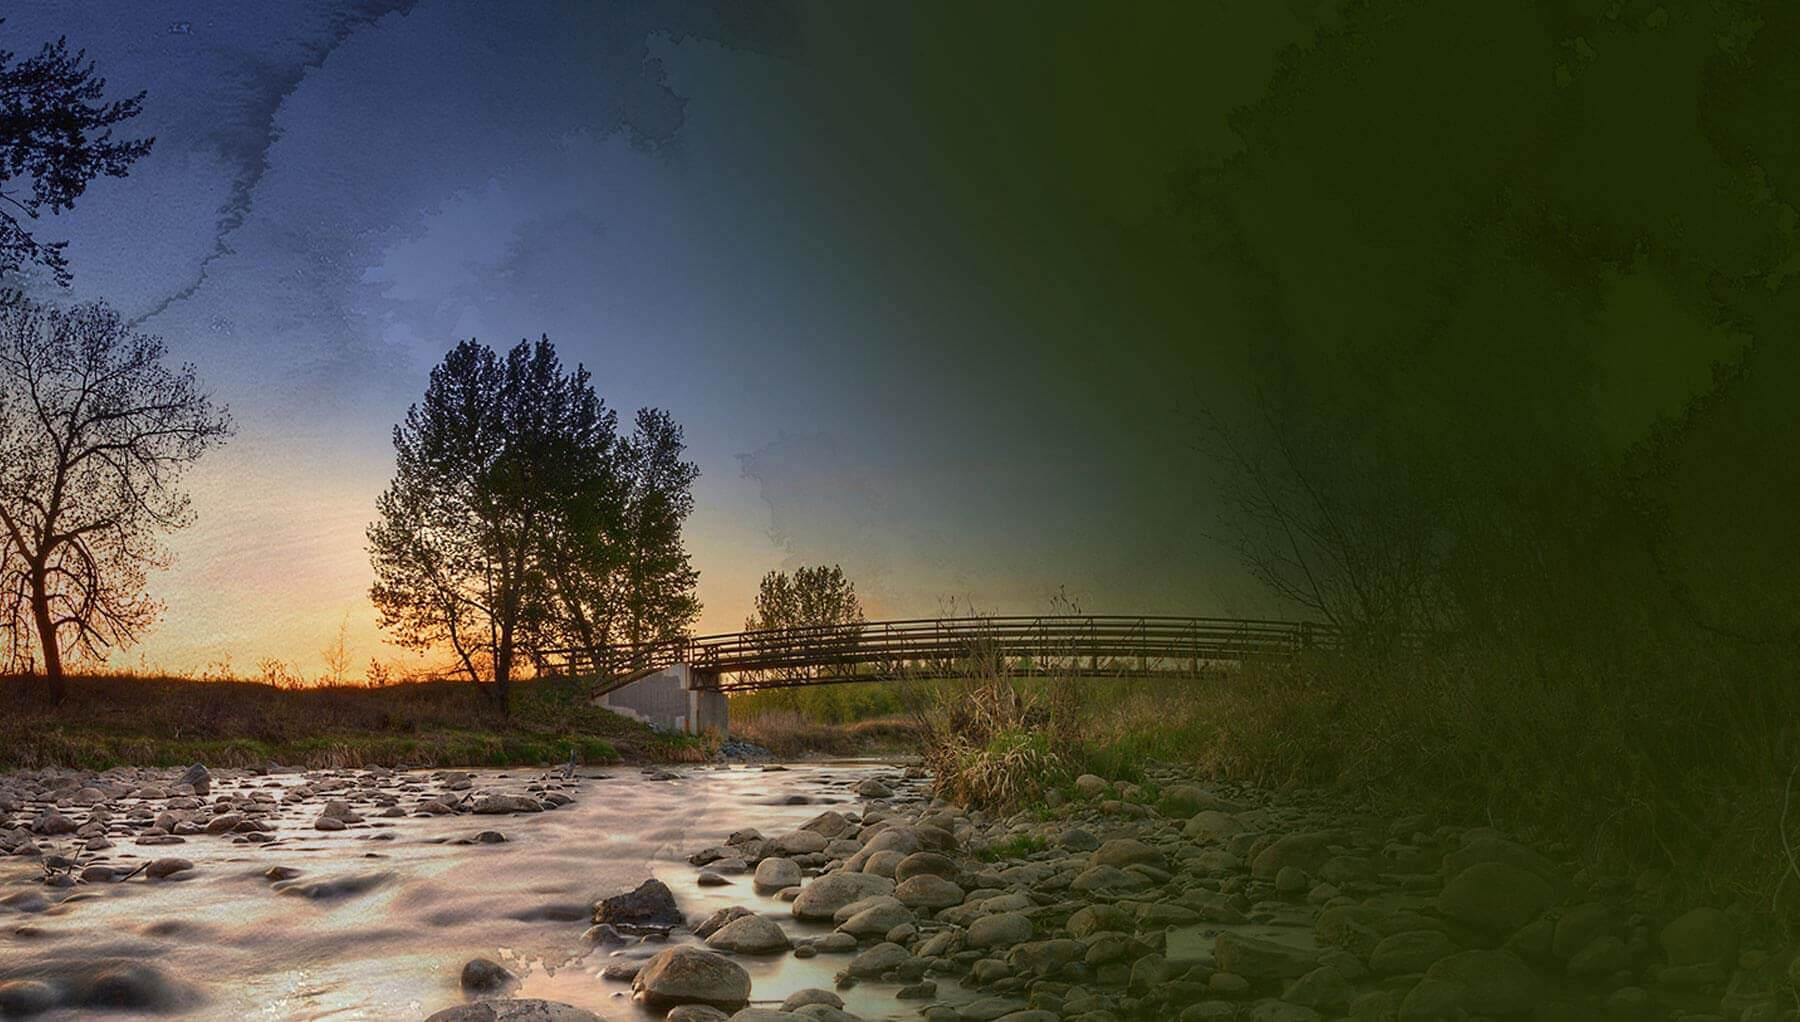 Sunset in Fish Creek Provincial Park, Shawnee Park, Calgary